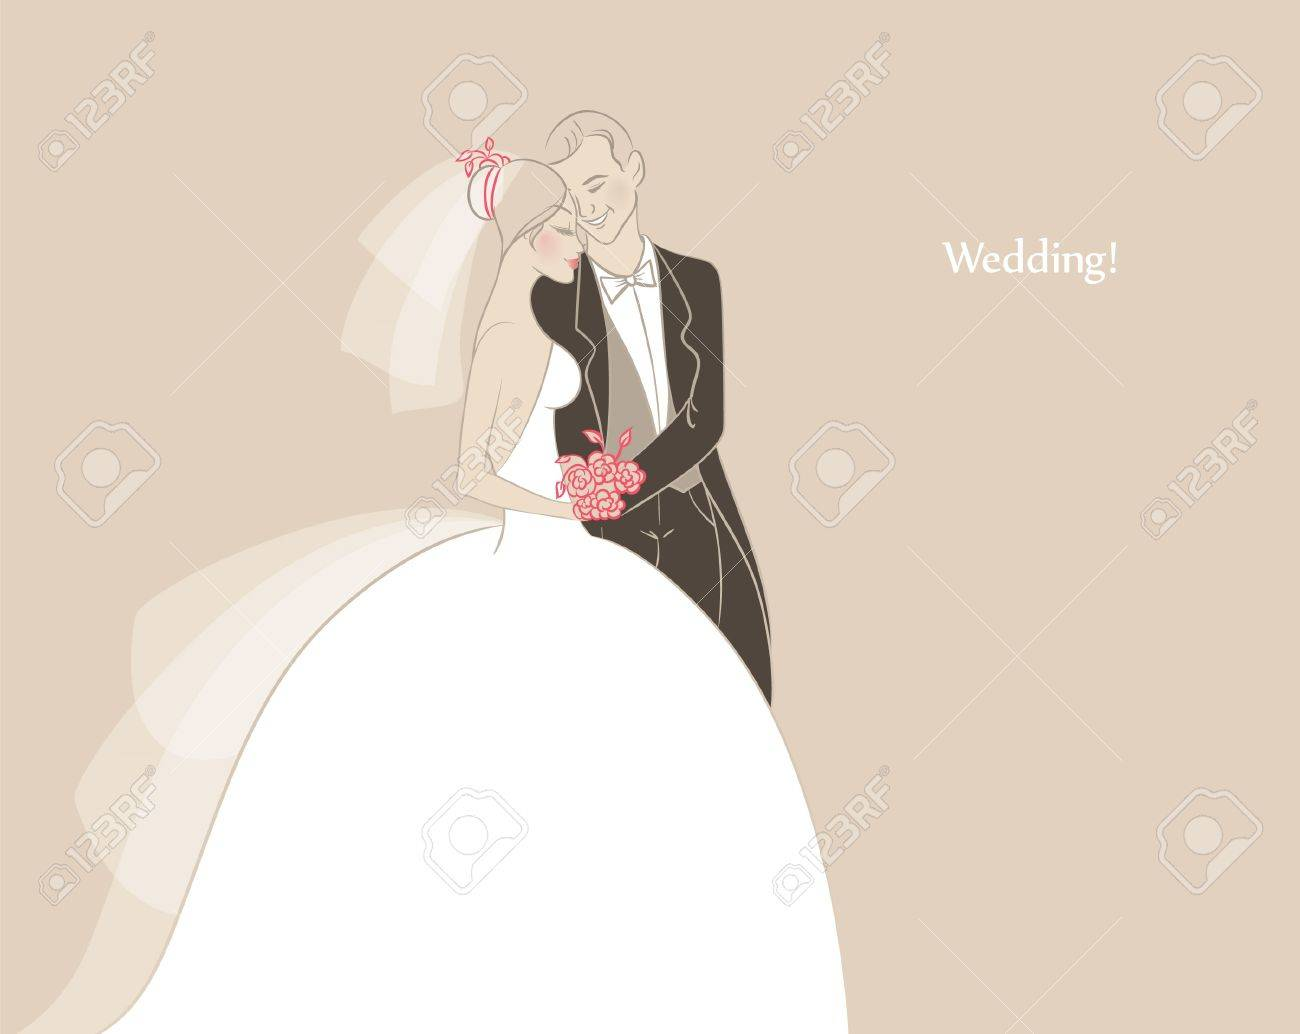 Vector illustration of Wedding Stock Vector - 15174948